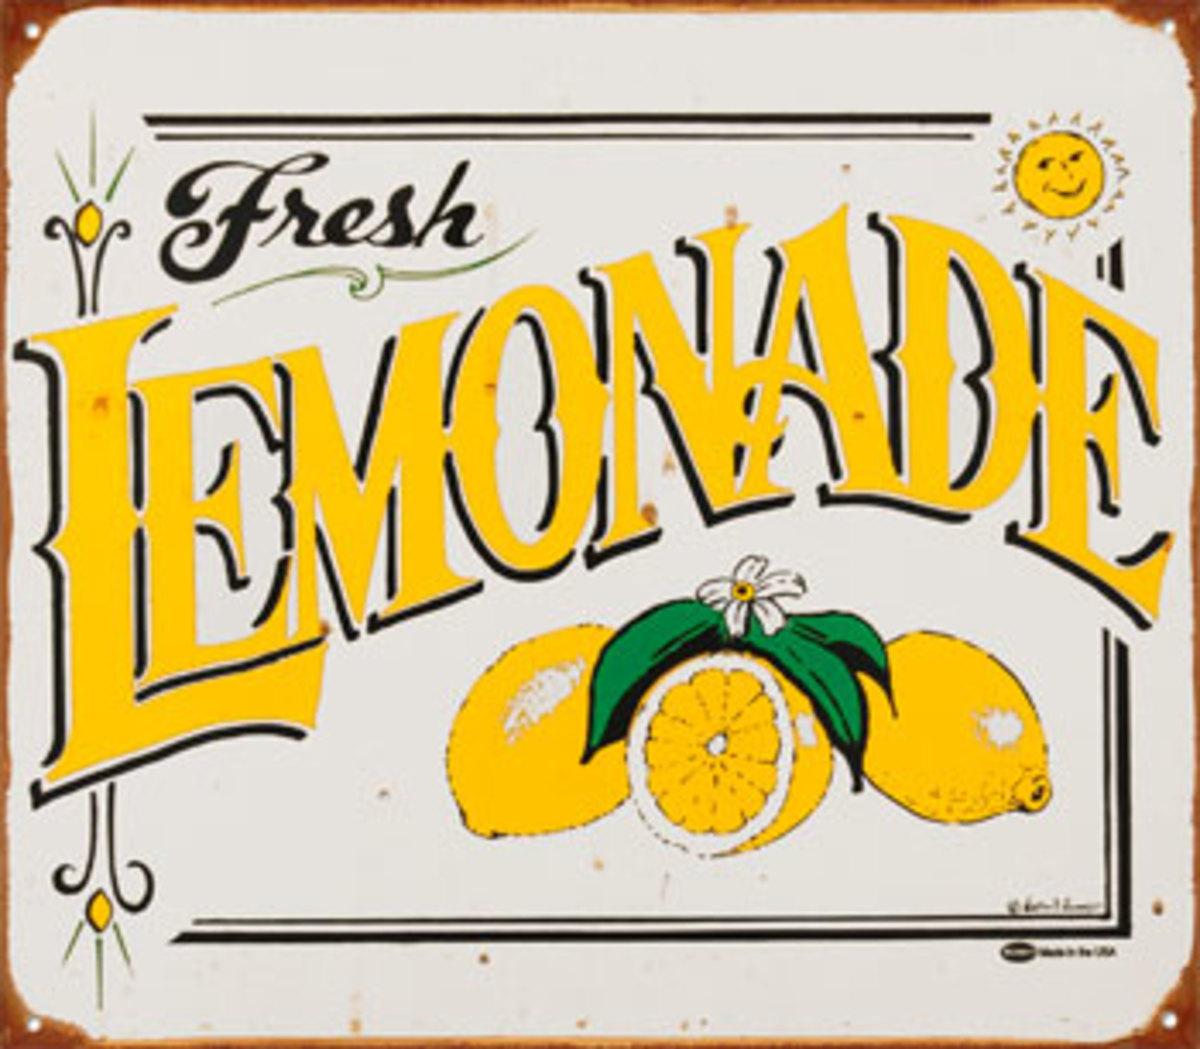 Ideas and Recipes for Lemonade - 66.0KB